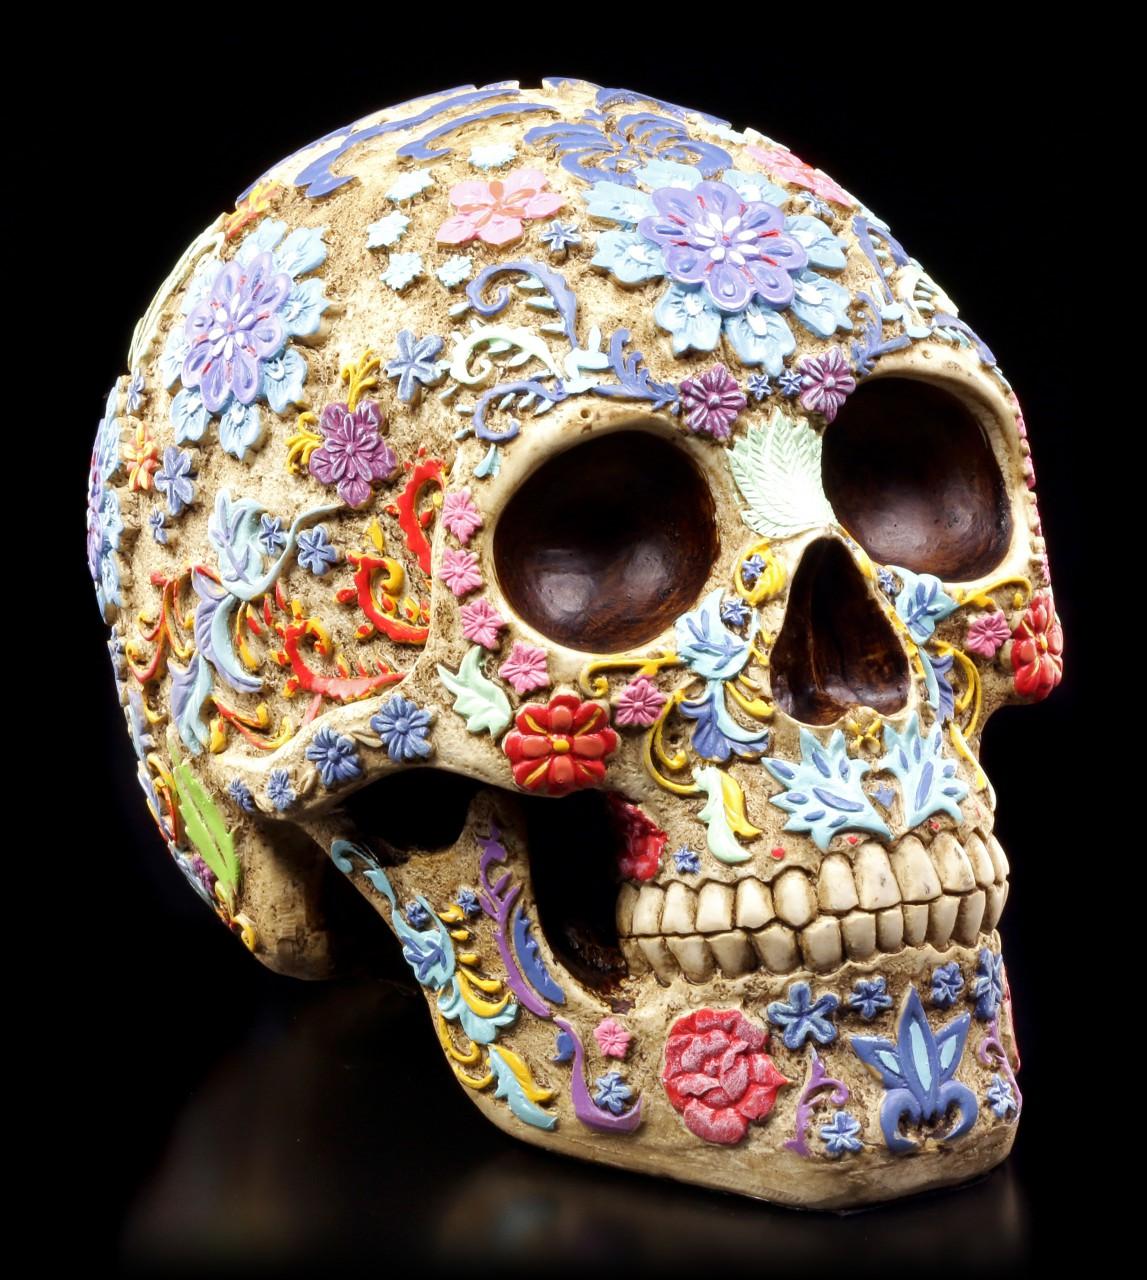 Beiger Totenkopf mit buntem Blumenmuster